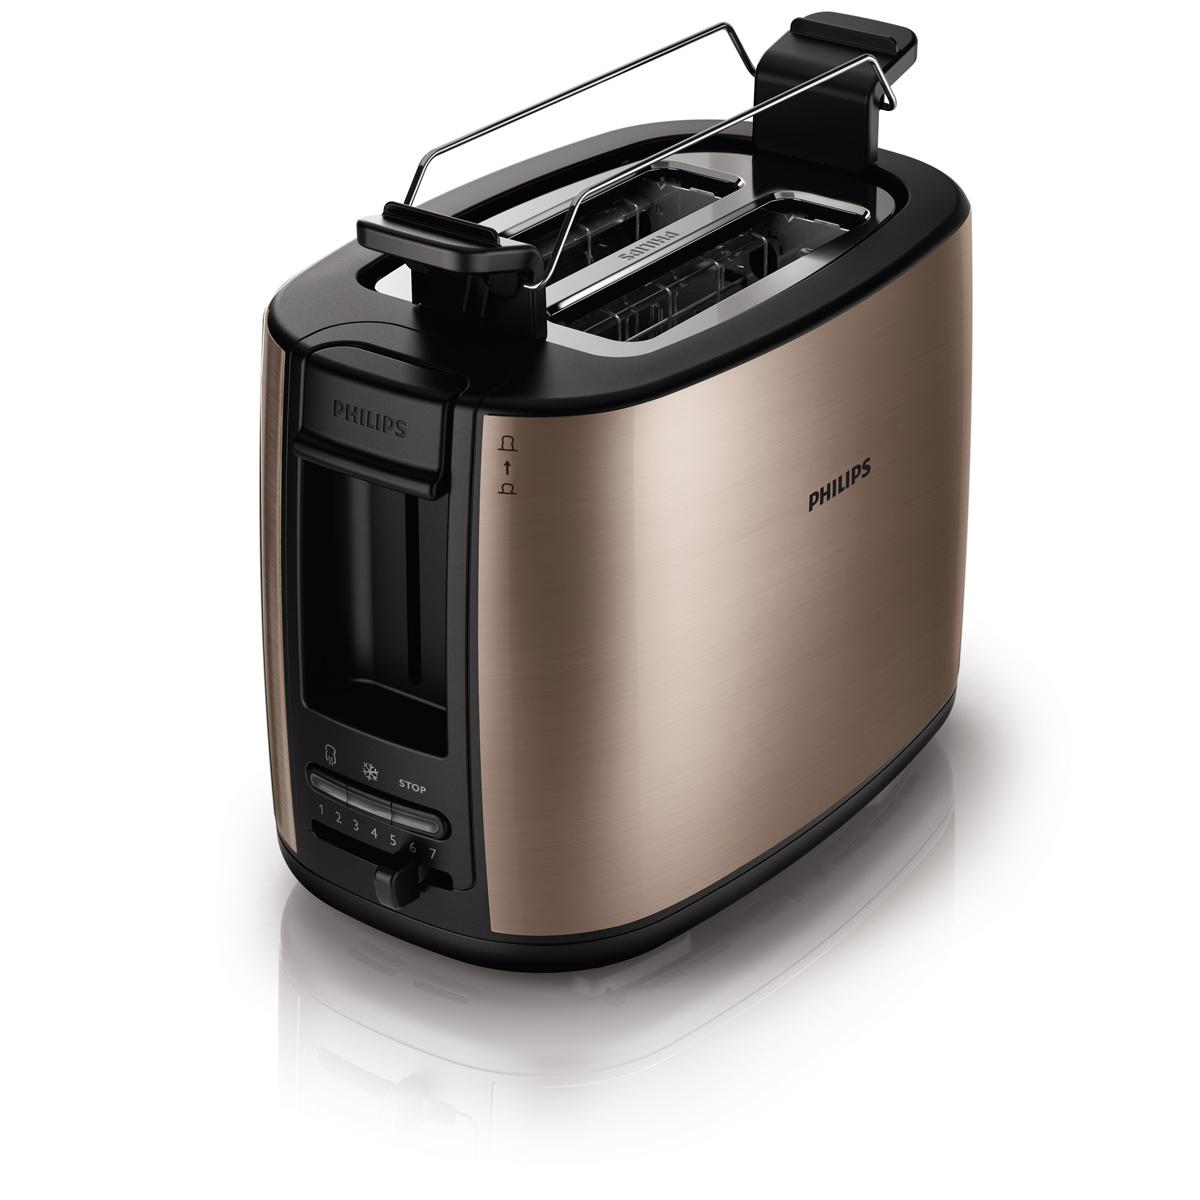 grille pain tous les fournisseurs 4 fentes toaster. Black Bedroom Furniture Sets. Home Design Ideas